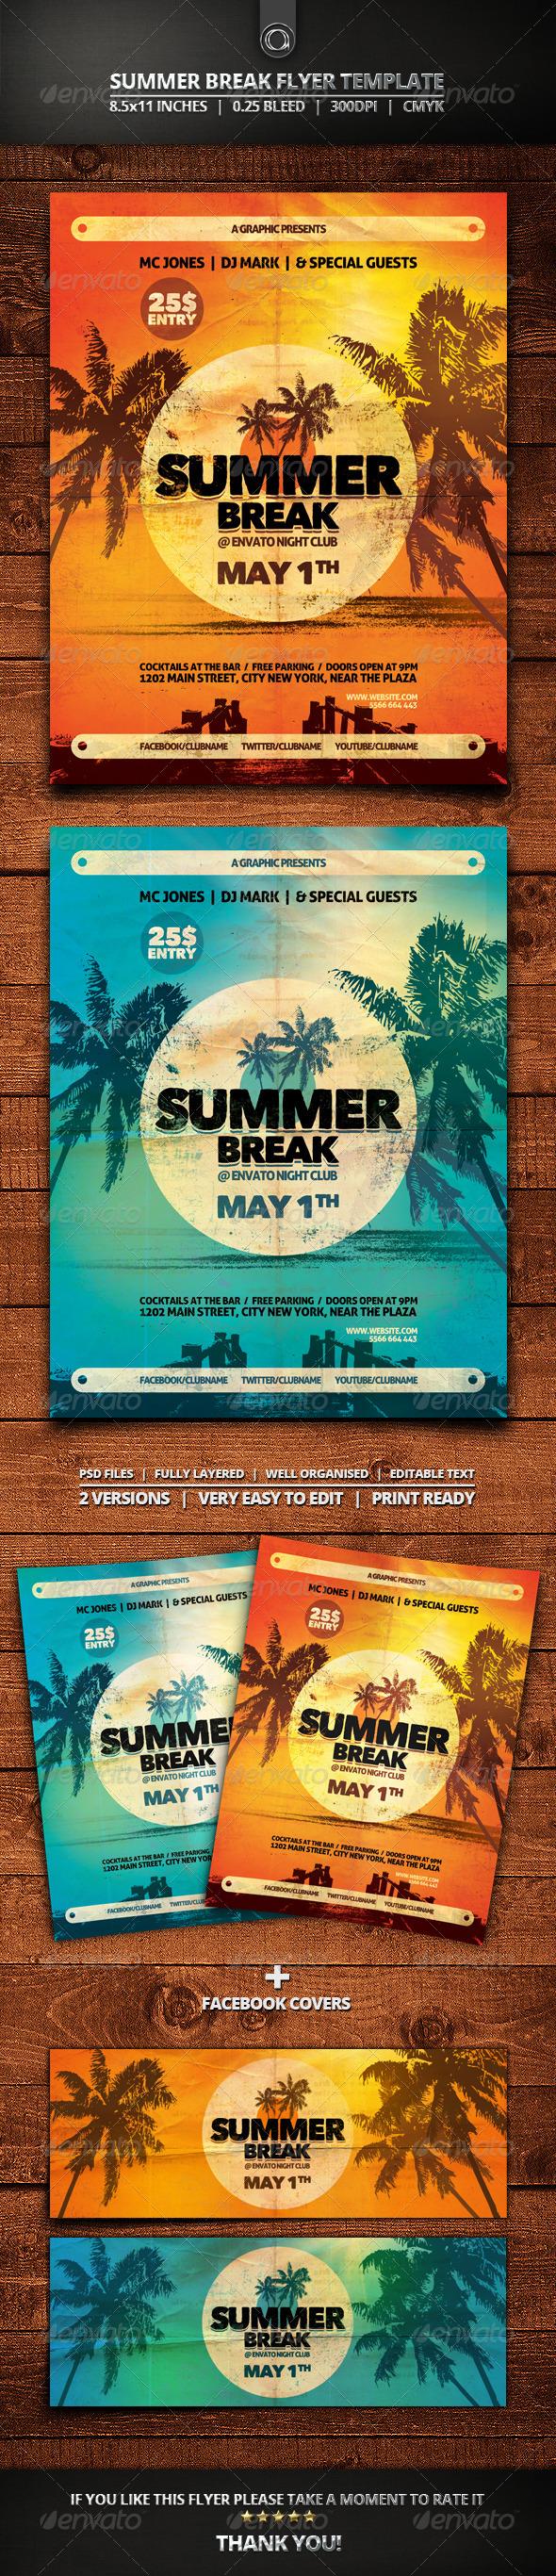 GraphicRiver Summer Break Flyer Template 7365913